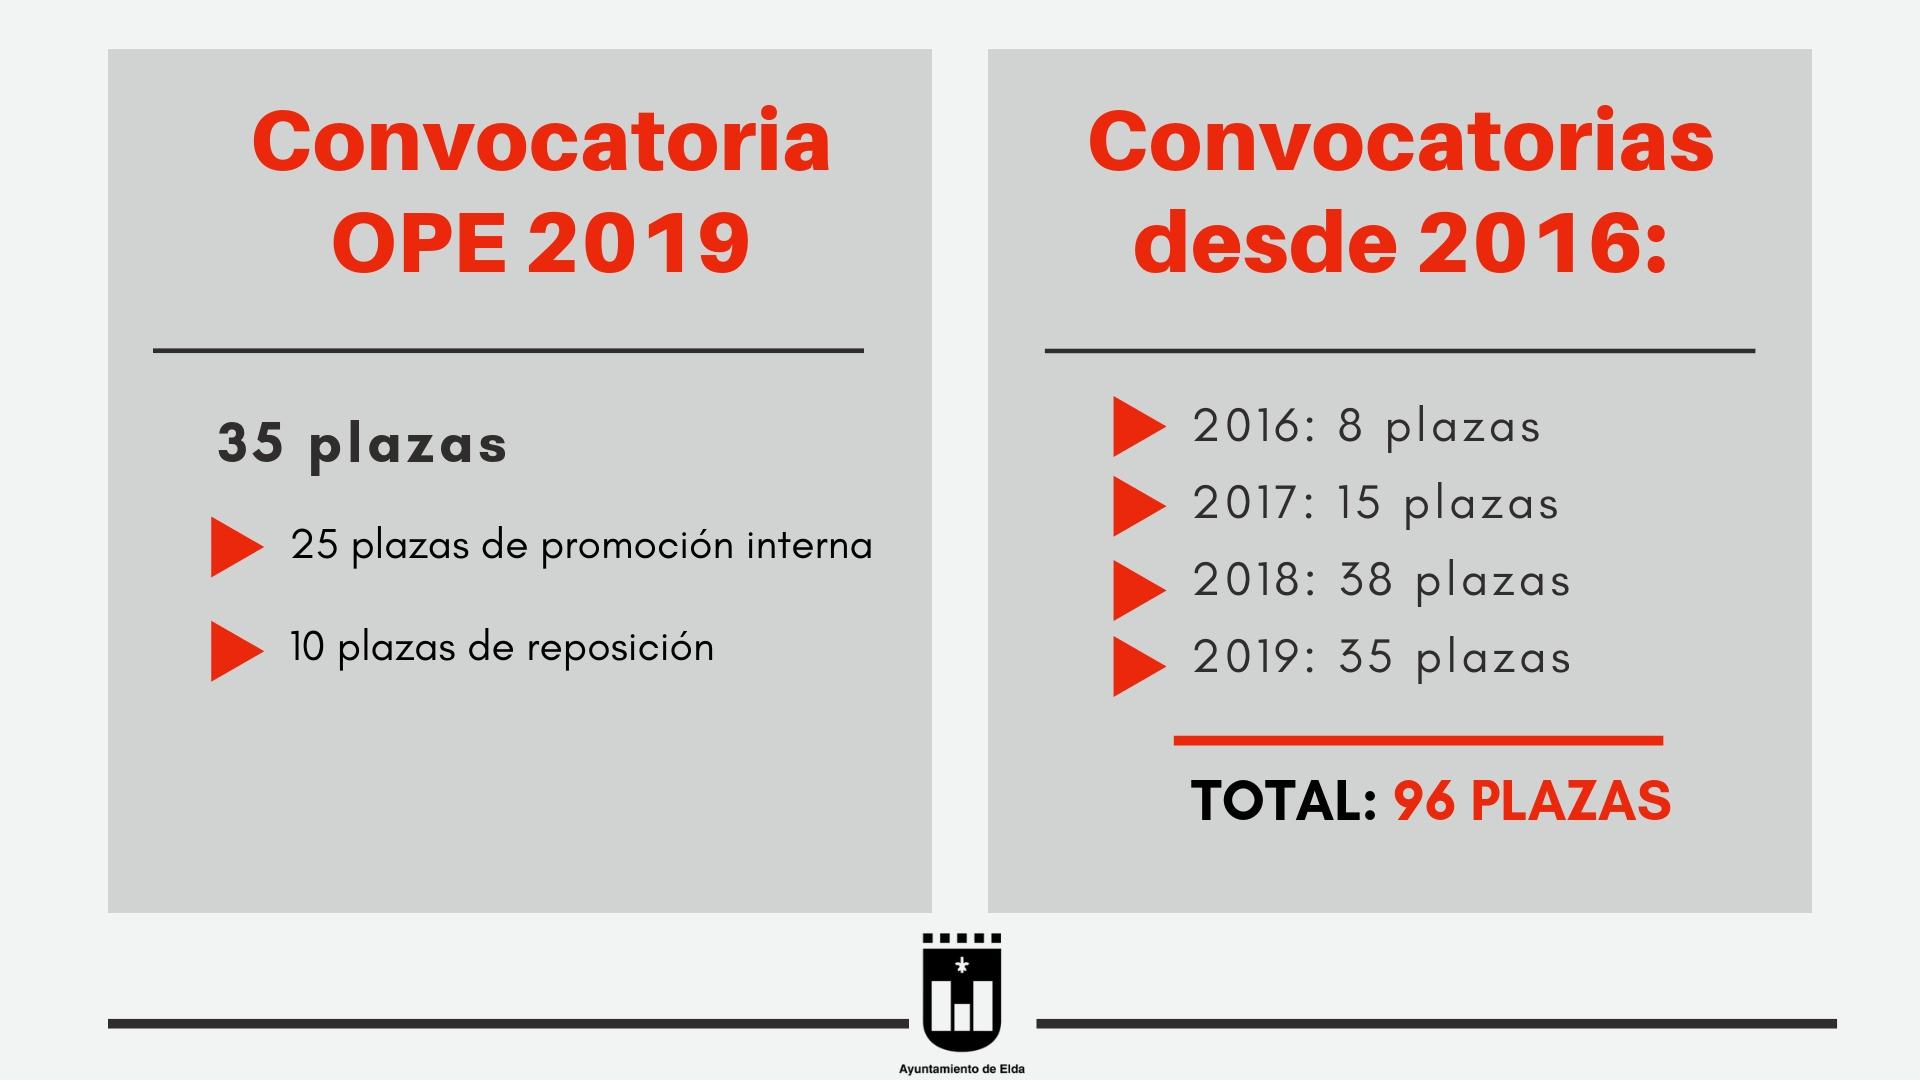 Convocatoria OPE 2019